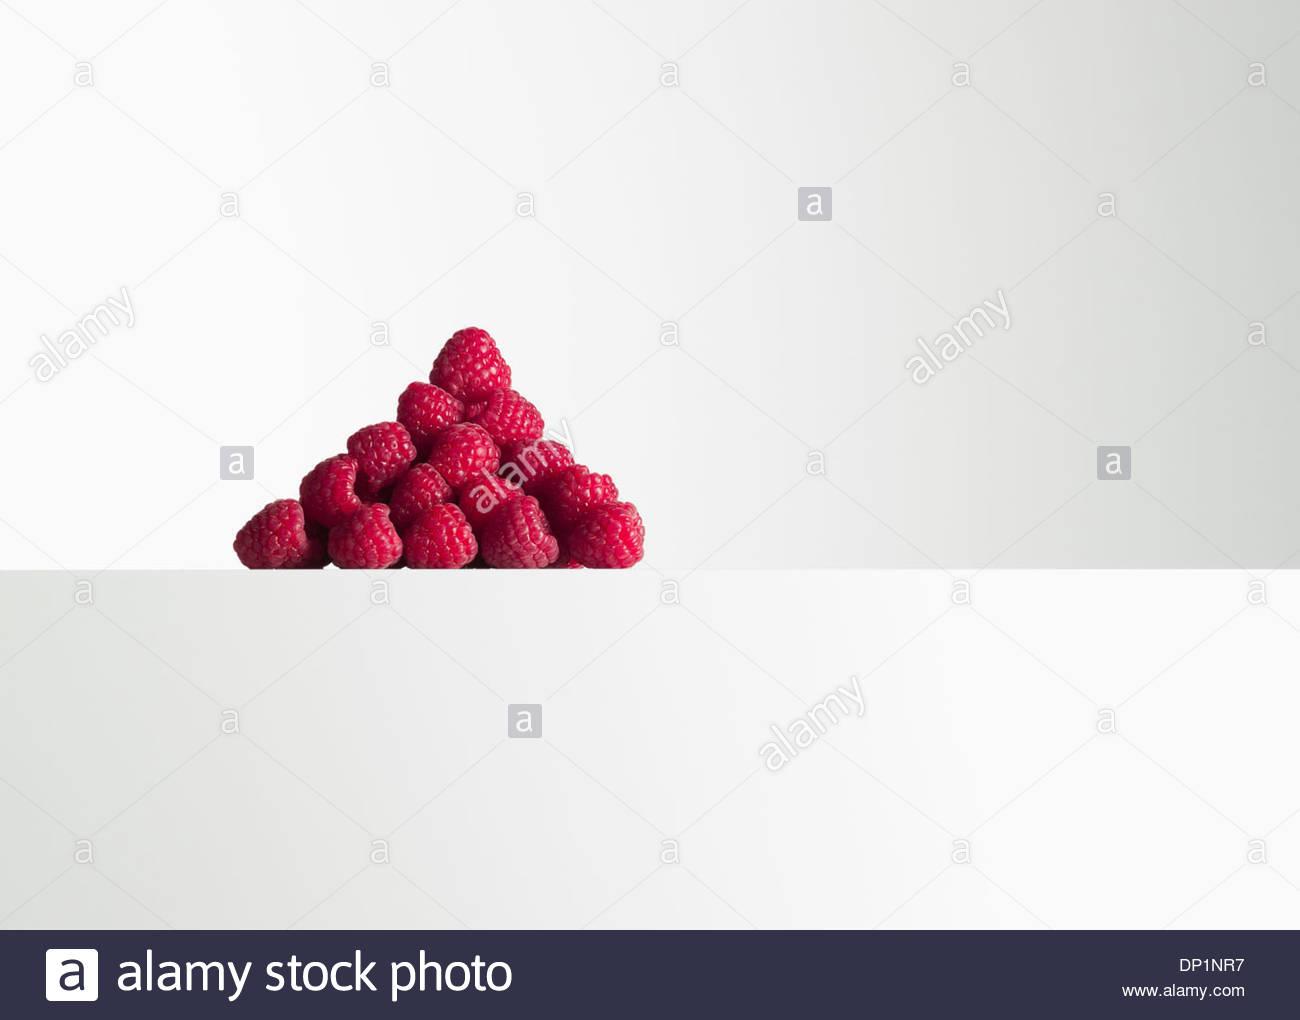 Raspberries in pile - Stock Image